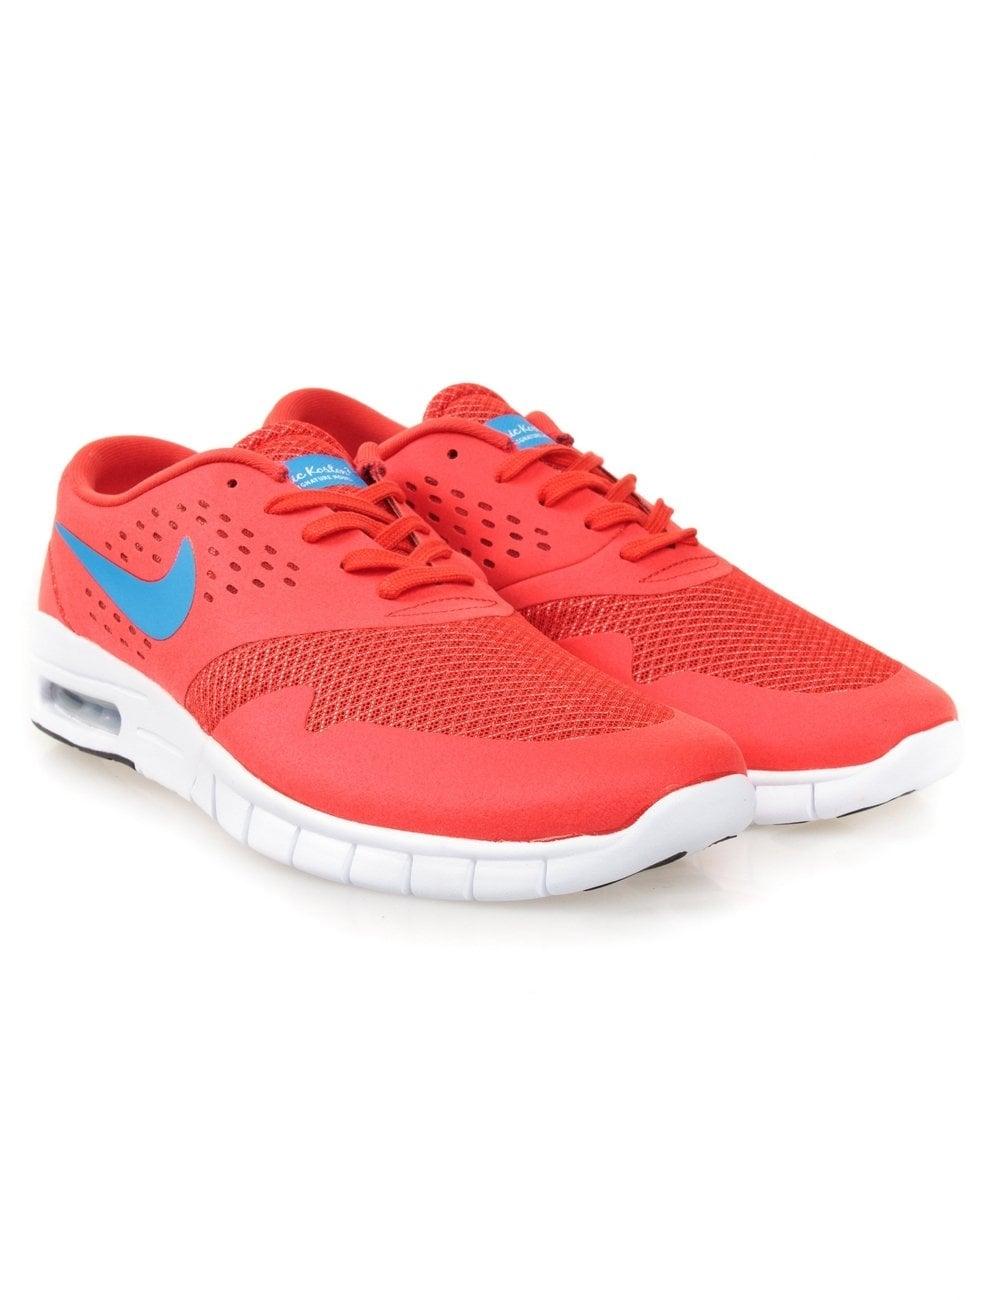 19c534e2c9a5 Nike SB Eric Koston 2 Max - Light Crimson - Footwear from Fat Buddha ...